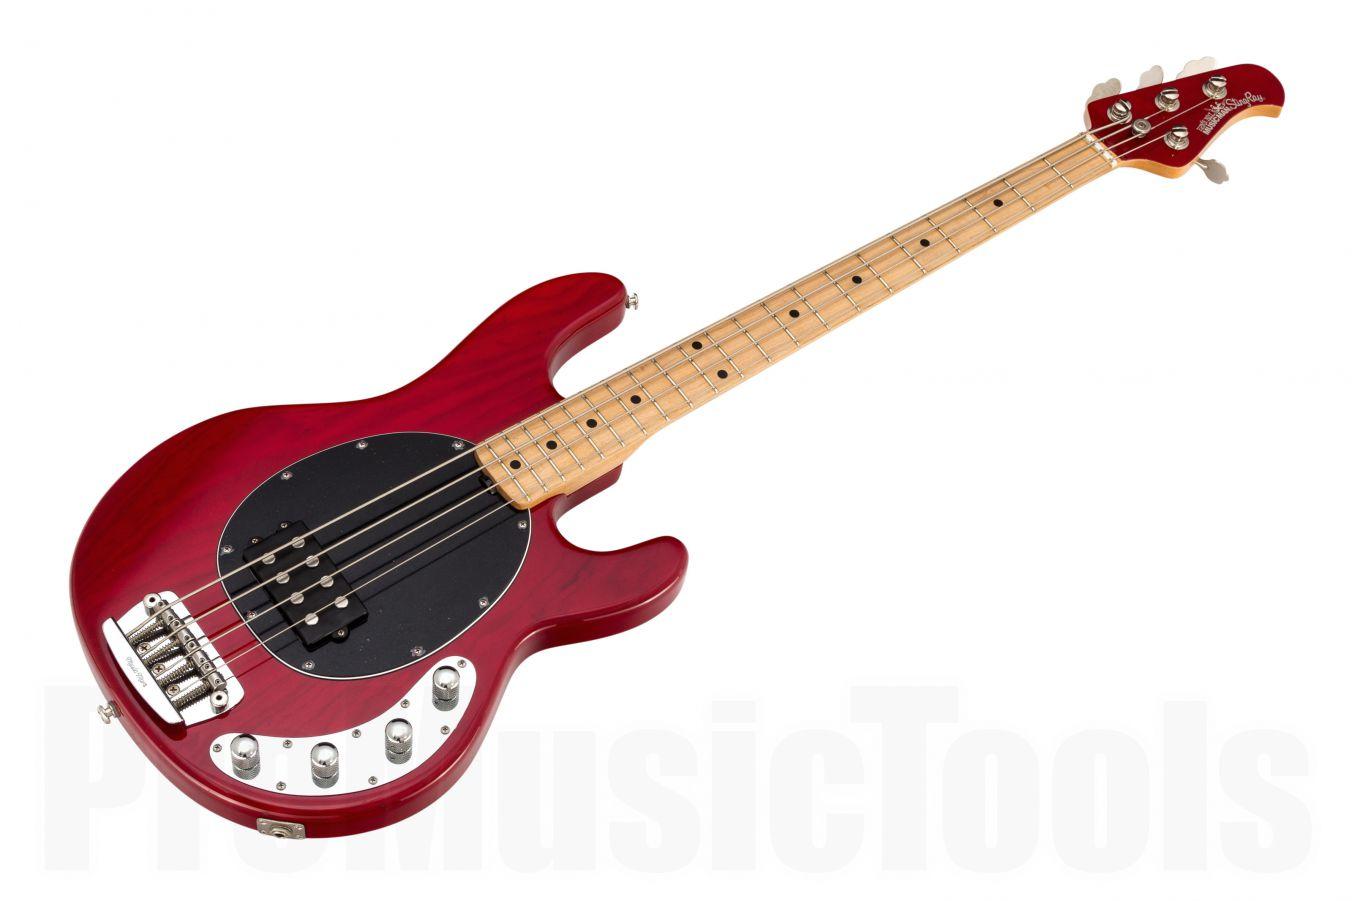 Music Man USA Stingray 4 TR - Translucent Red MN MH BKPG